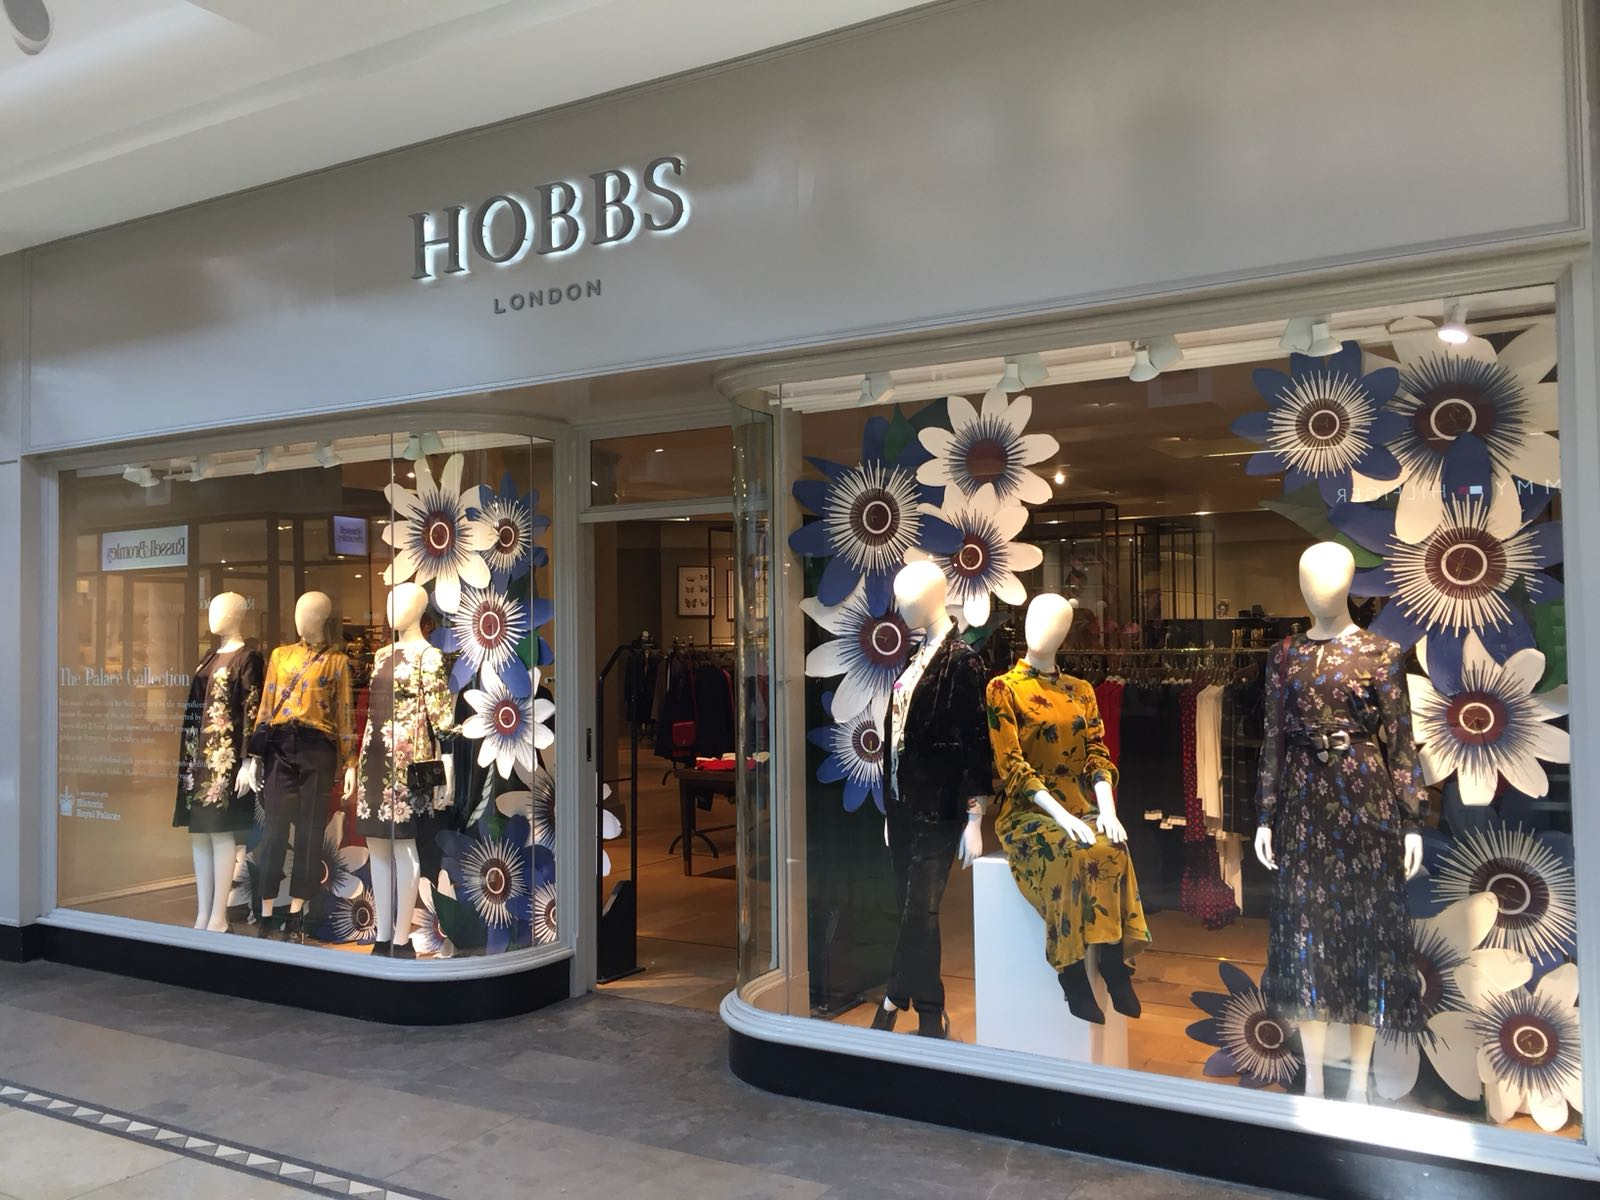 Bespoke passionflowers for Hobbs window display